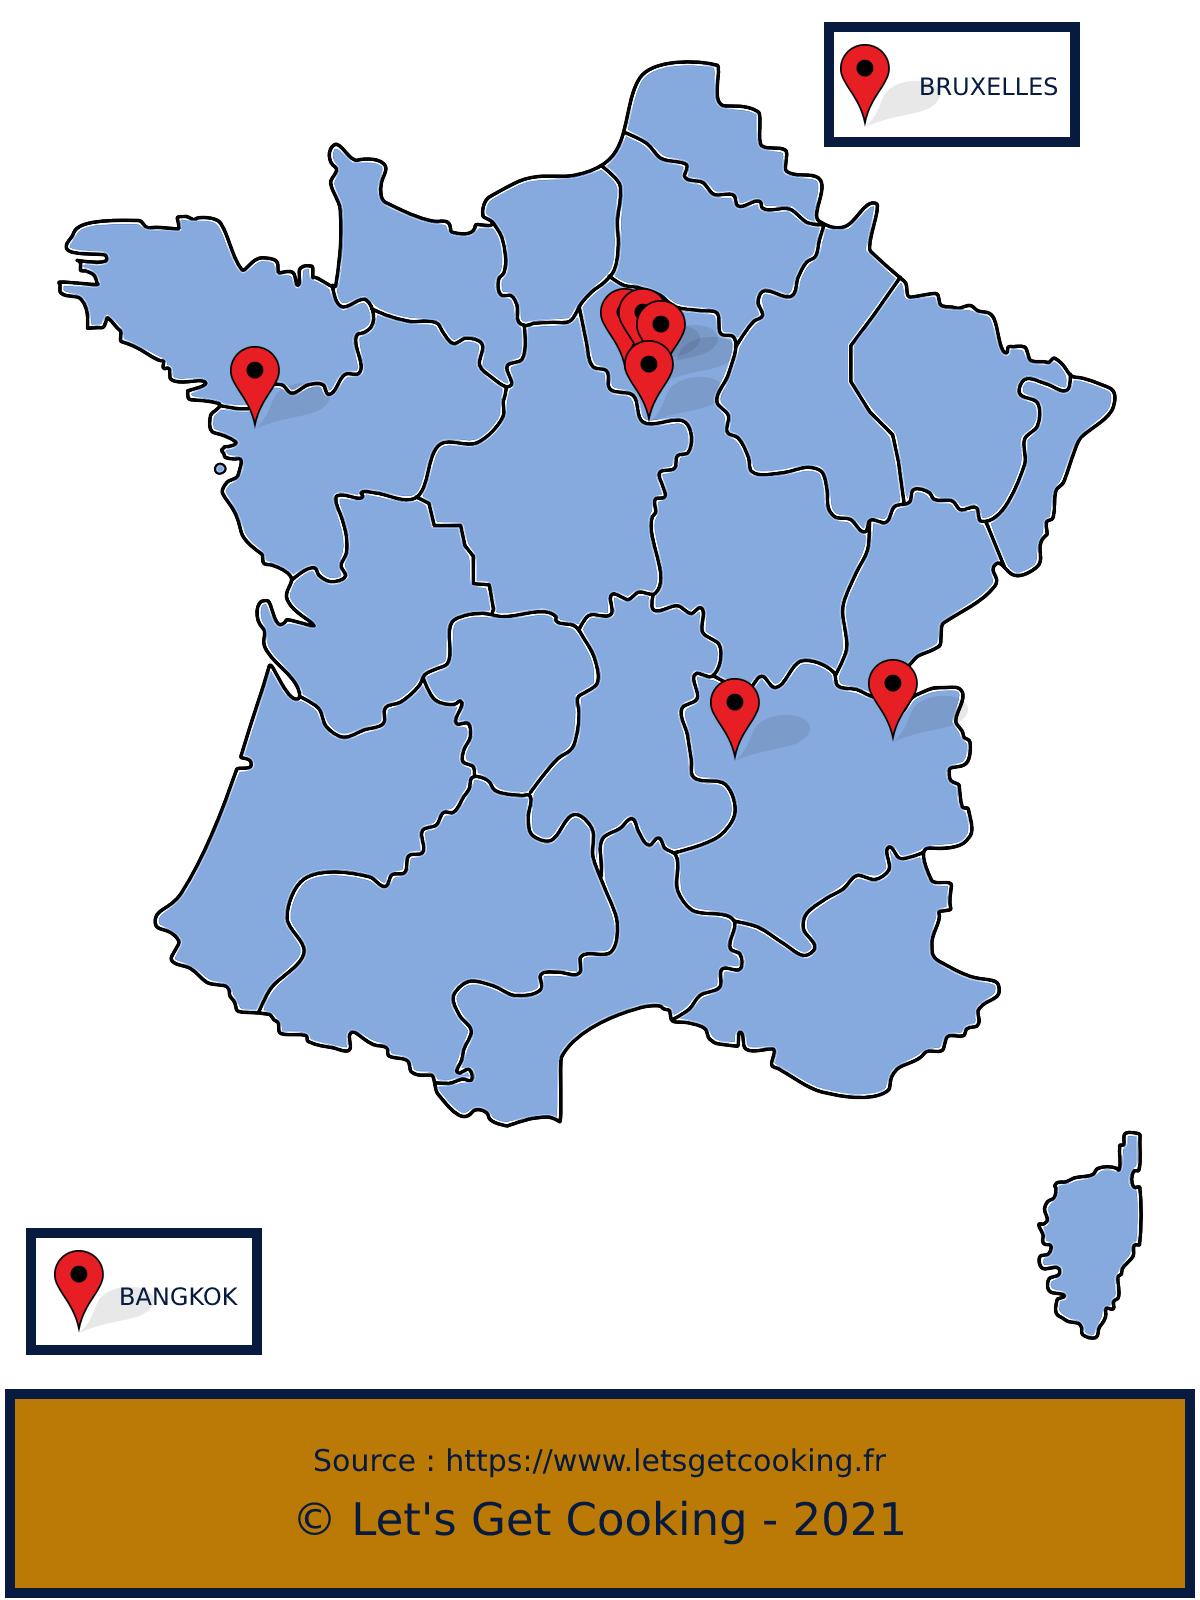 Carte de France des candidats de TOP Chef 2021